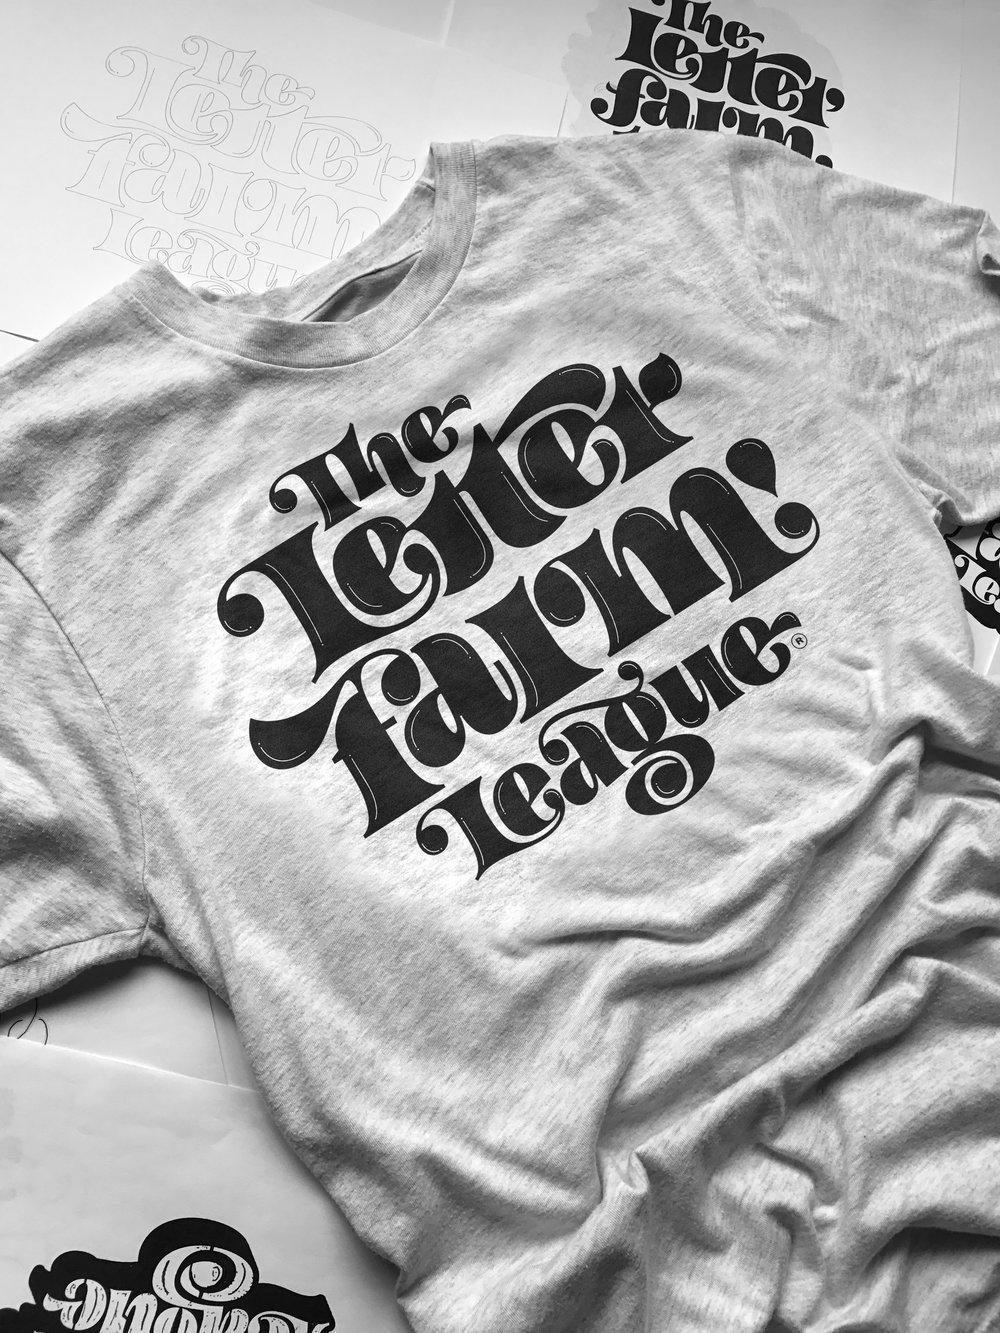 LF league shirt-2 copy 2.jpg